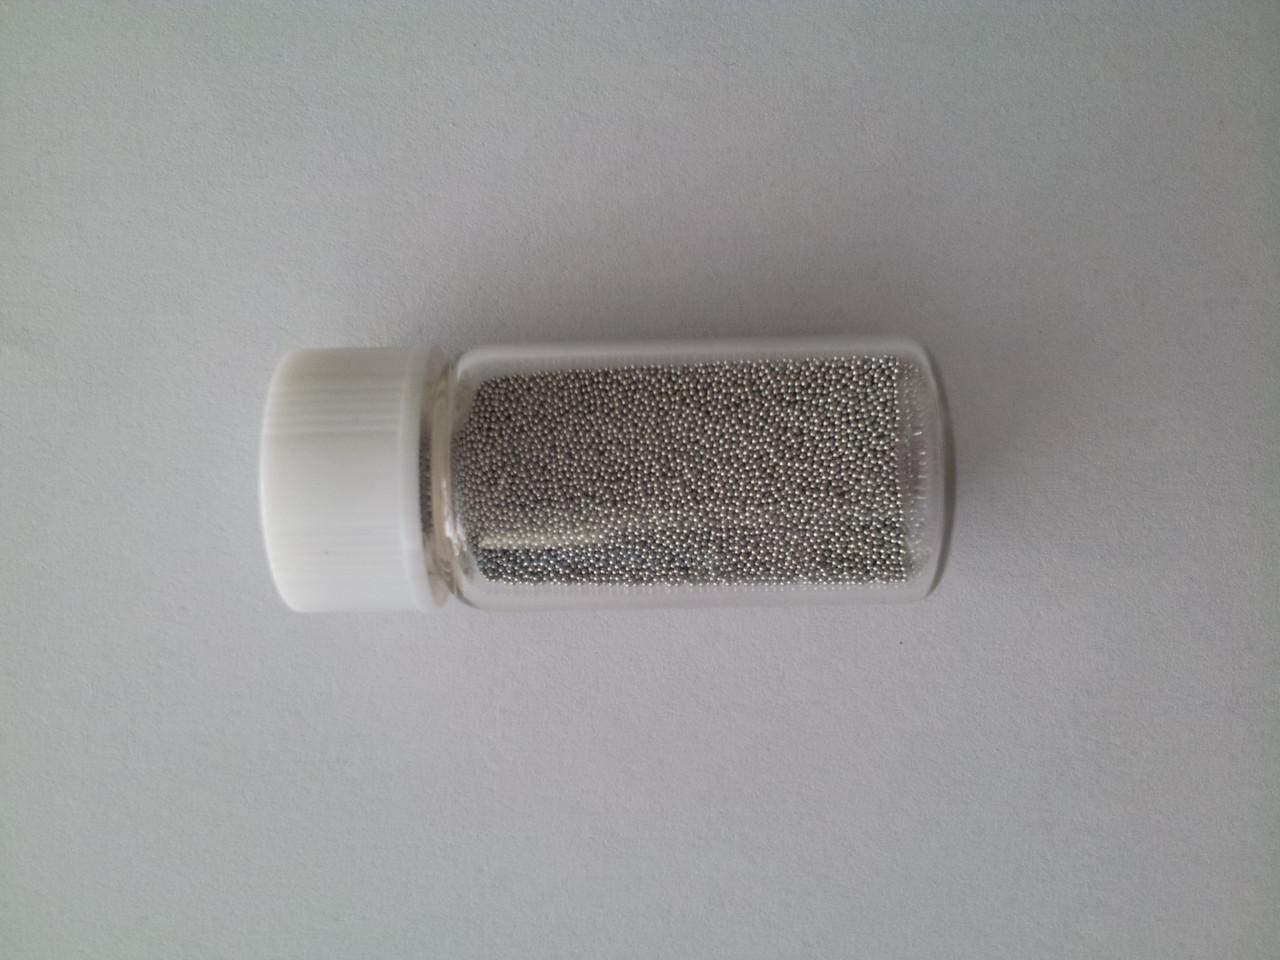 BGA шары 0,5 мм 2500шт. Sn63pb37